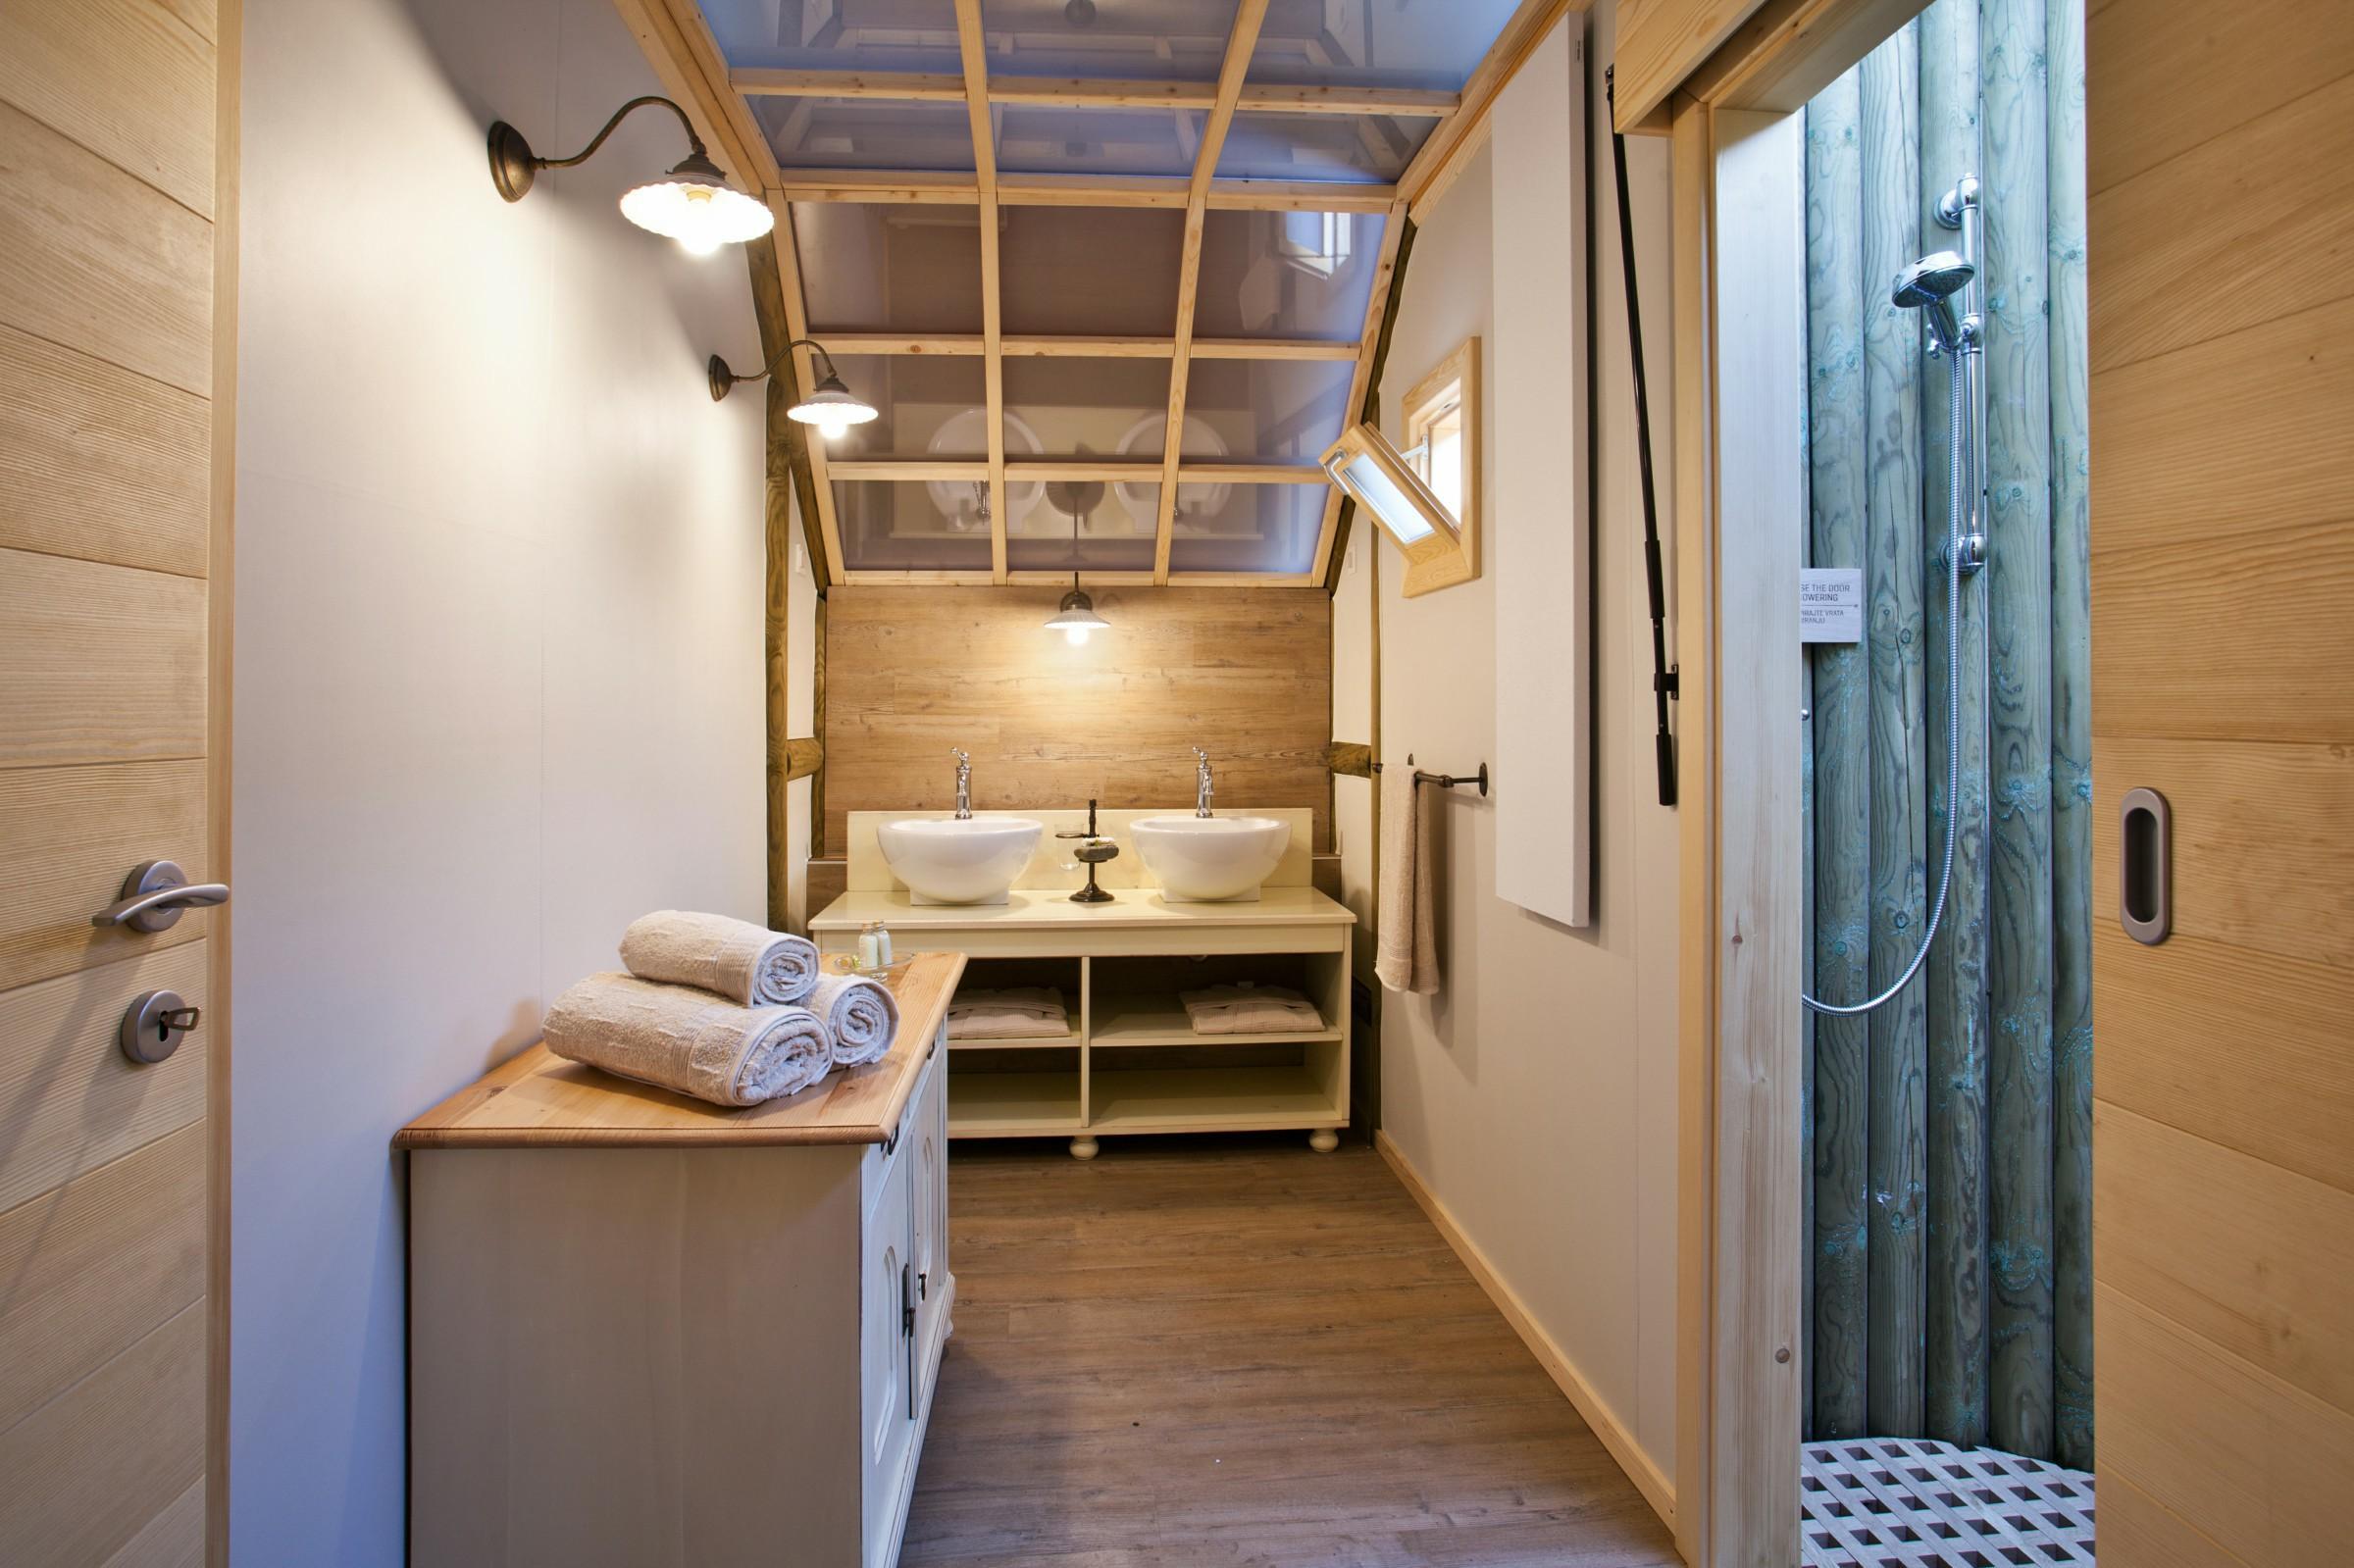 FormatFactoryCharming Herbal- Nastanitev kopalnica, foto Jost Gantar, Savinjska dolina